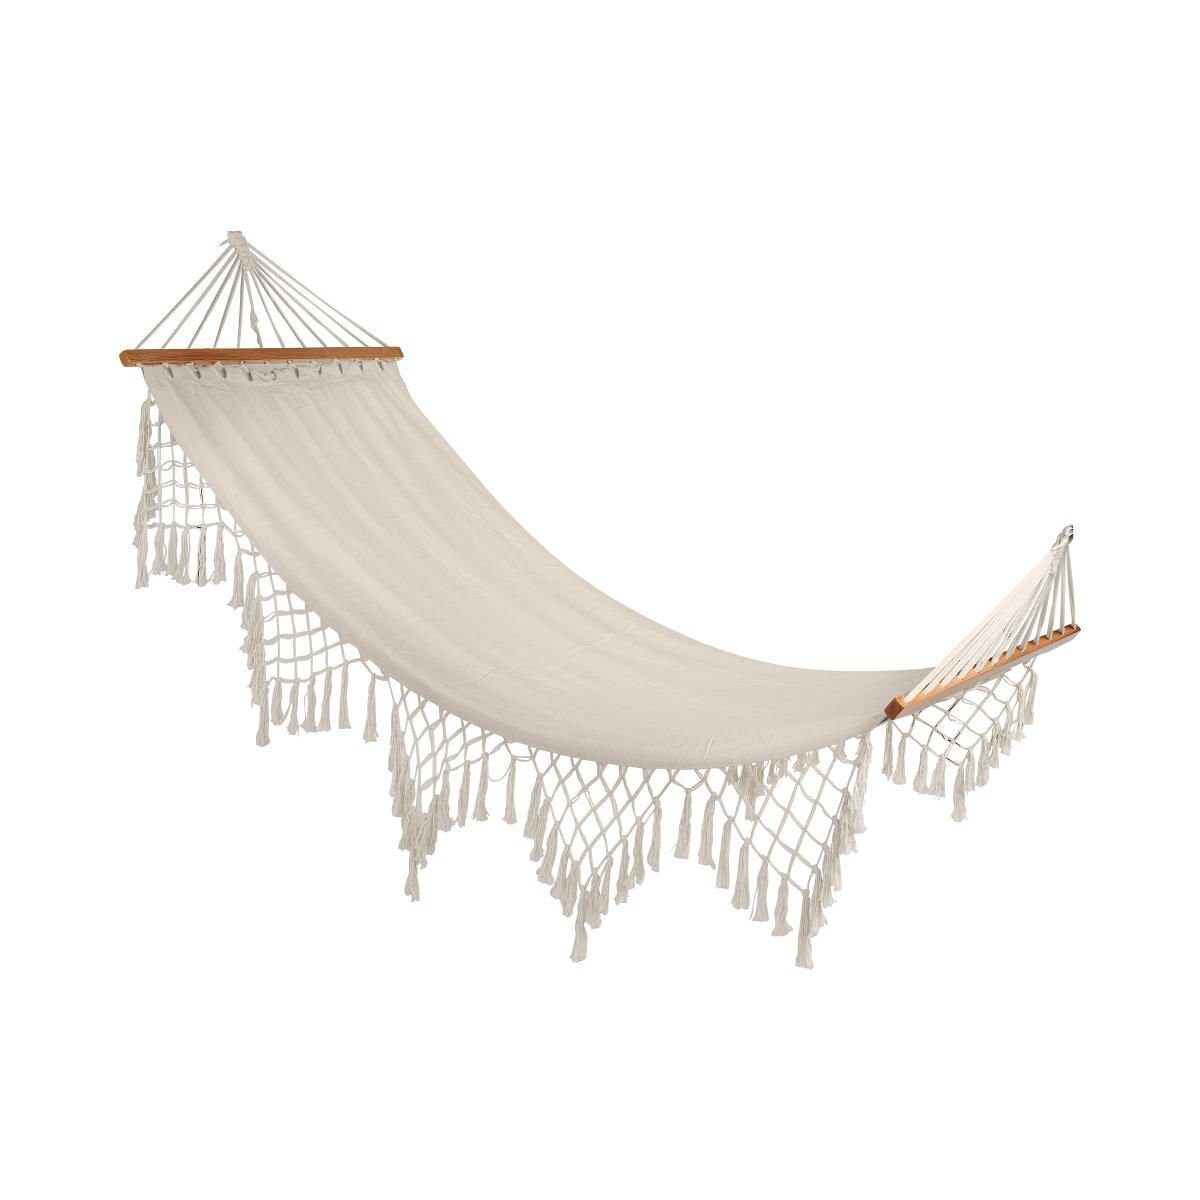 Butlers Gartentisch Weisses Gartenmobel Bilder Ideen Couch